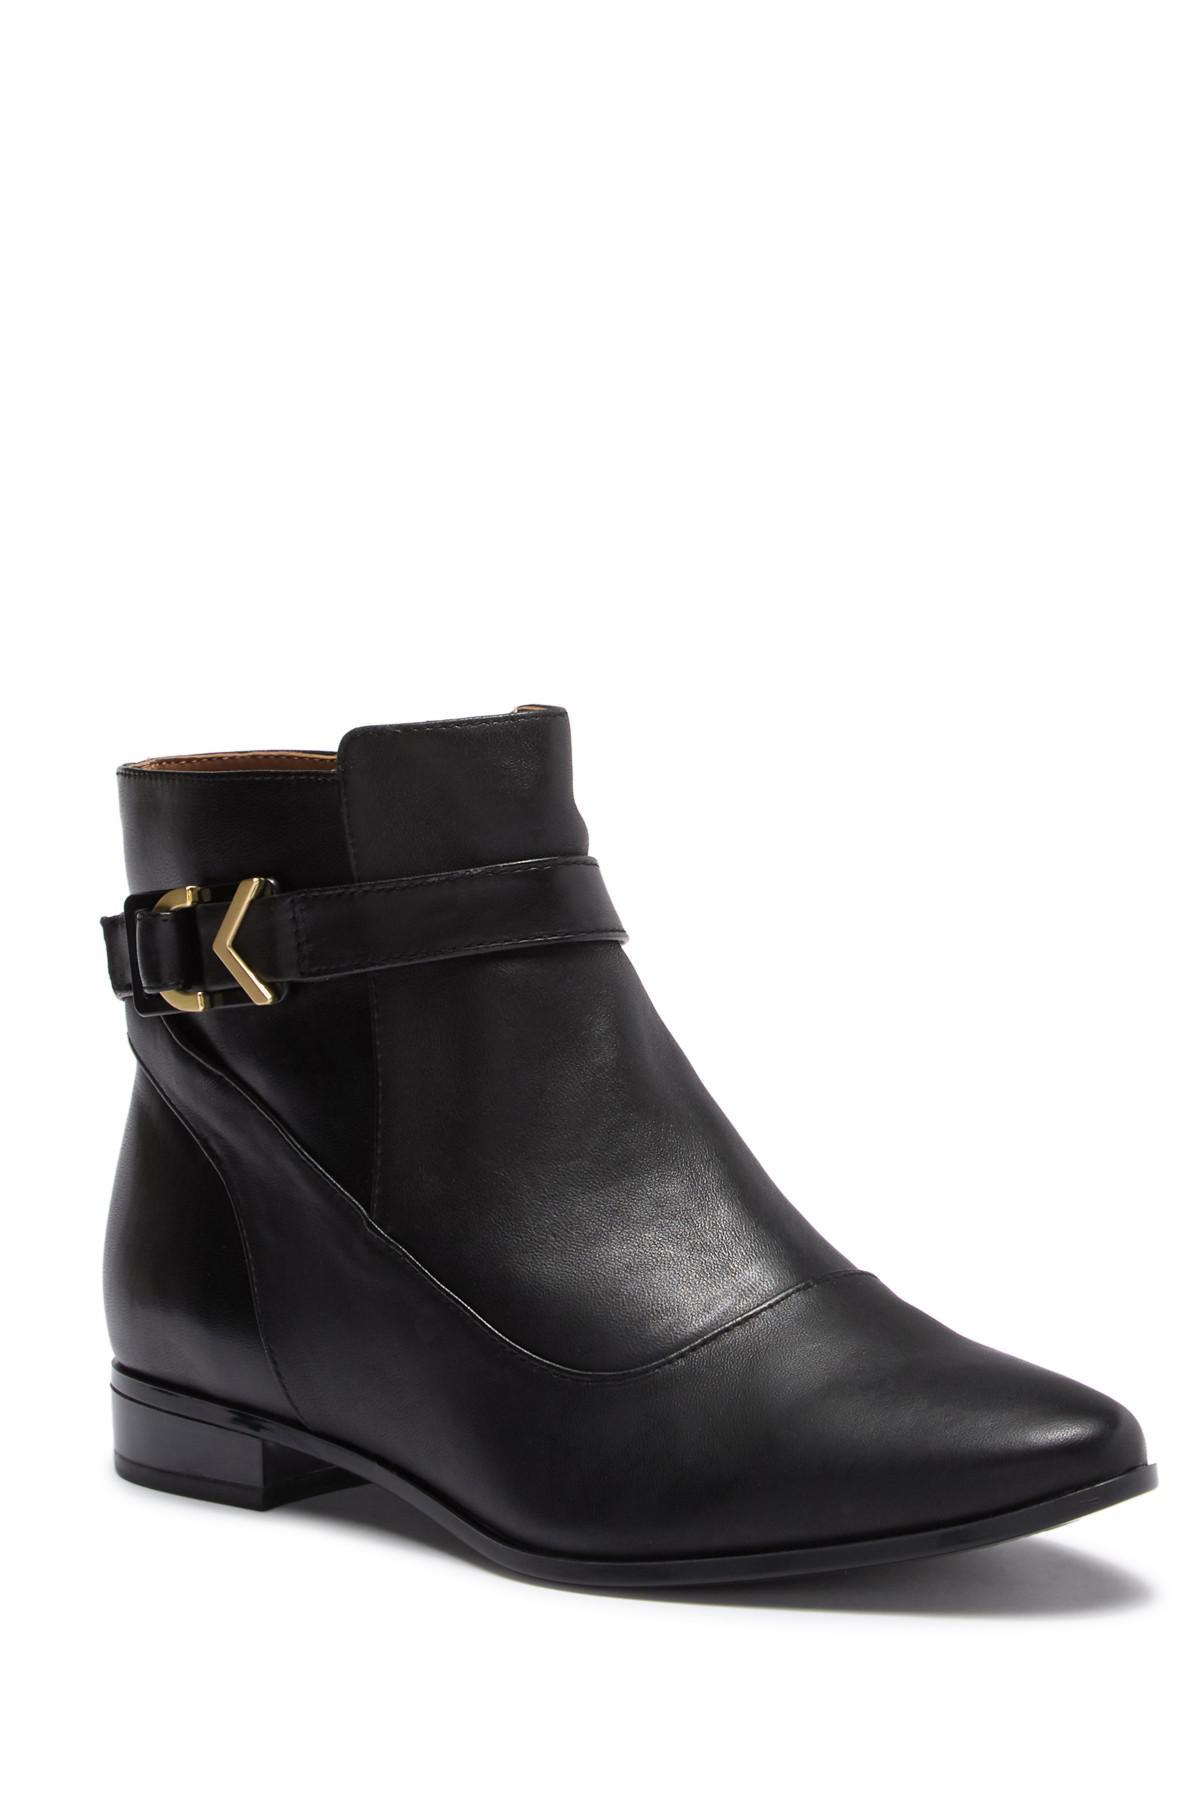 8ac10109cfff3 Lyst - Calvin Klein Farryn Bootie (women) in Black